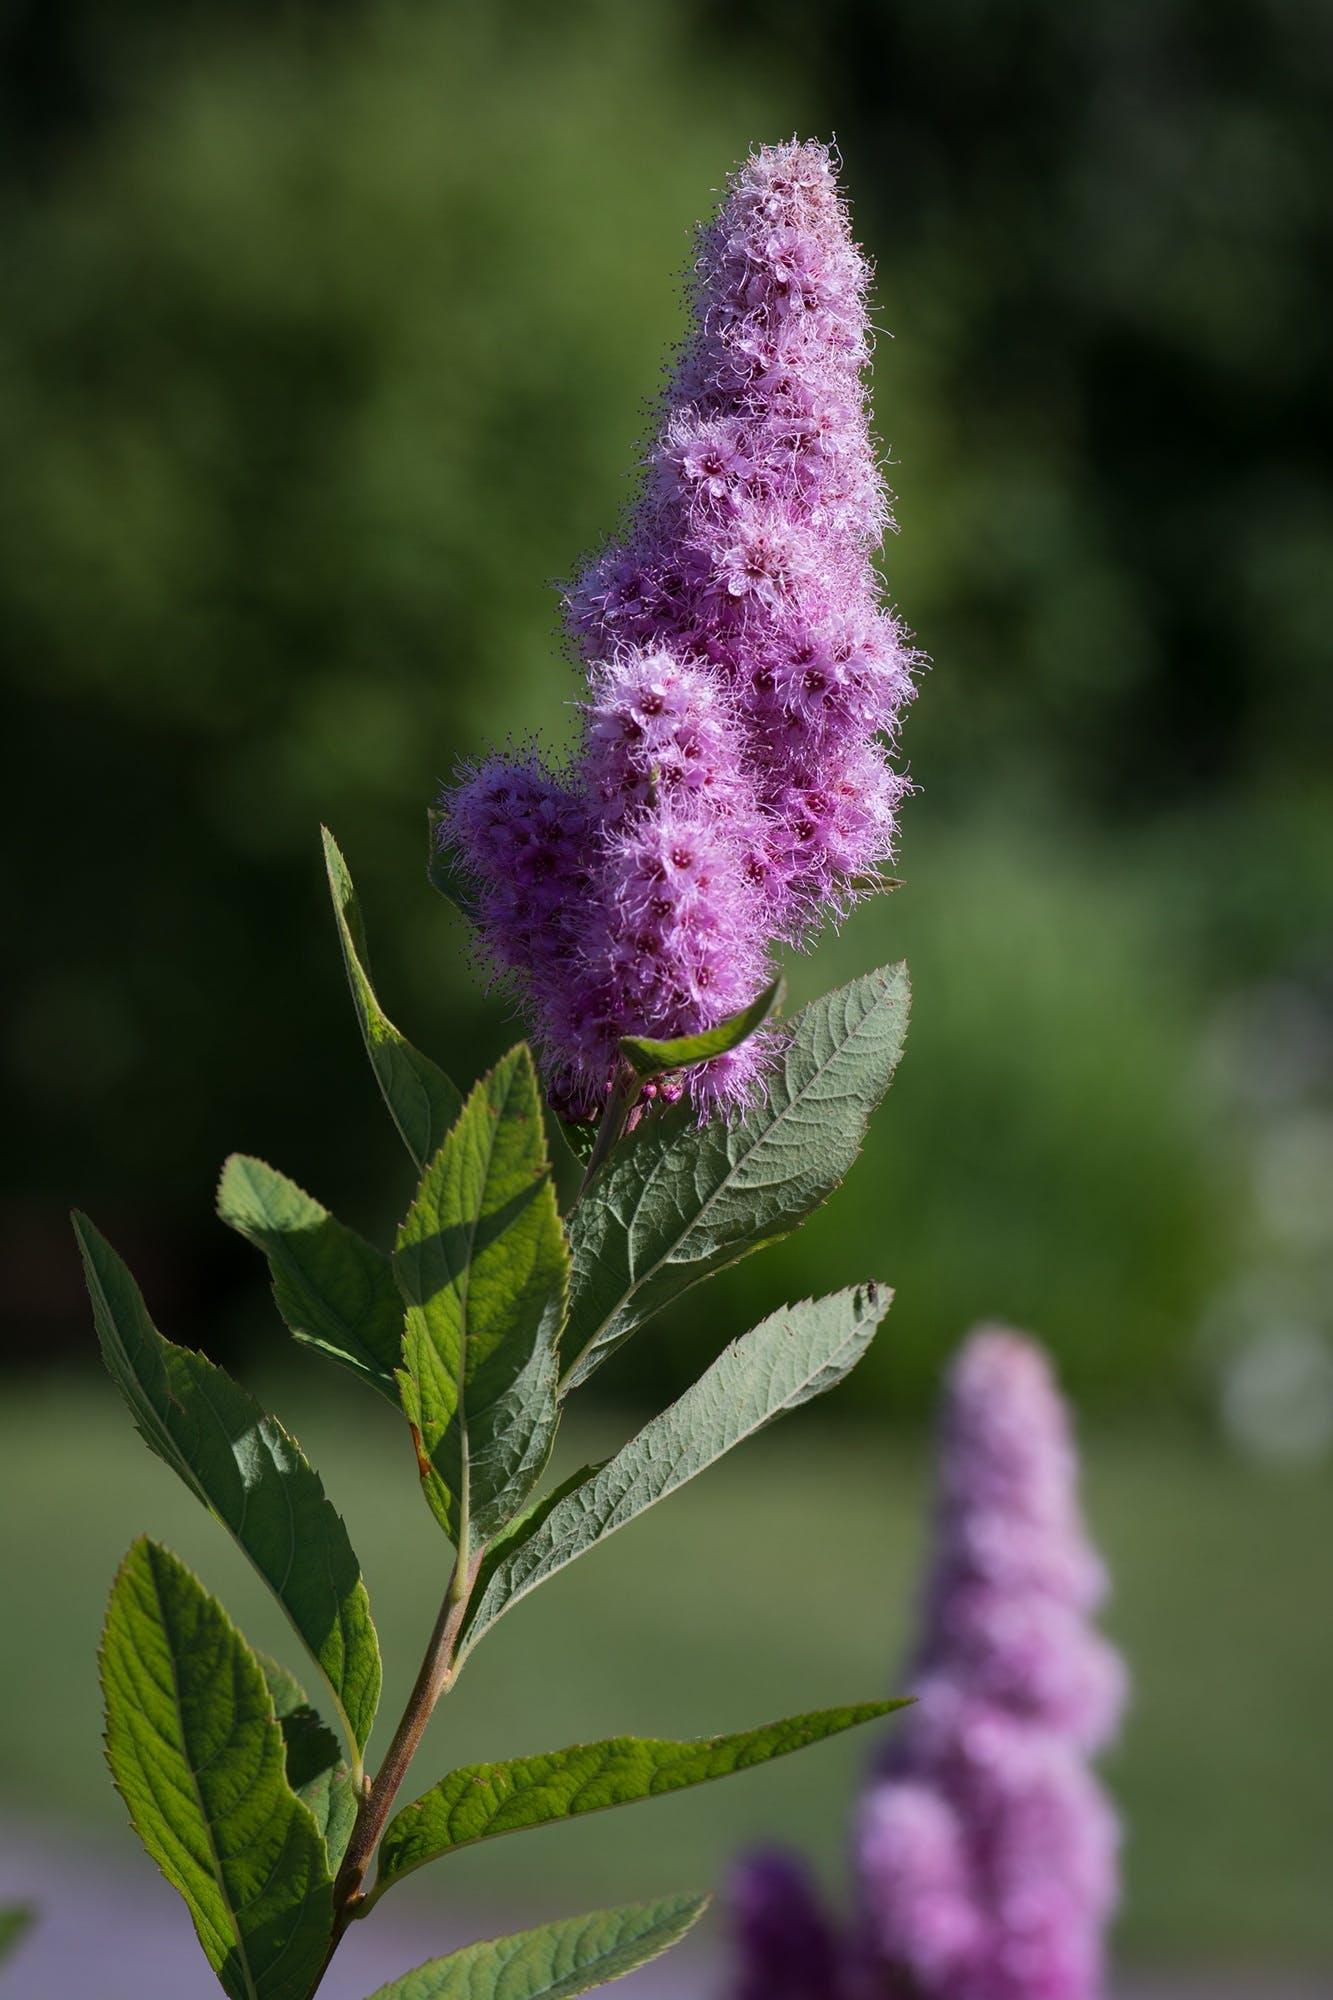 Free stock photo of nature, flowers, summer, bush